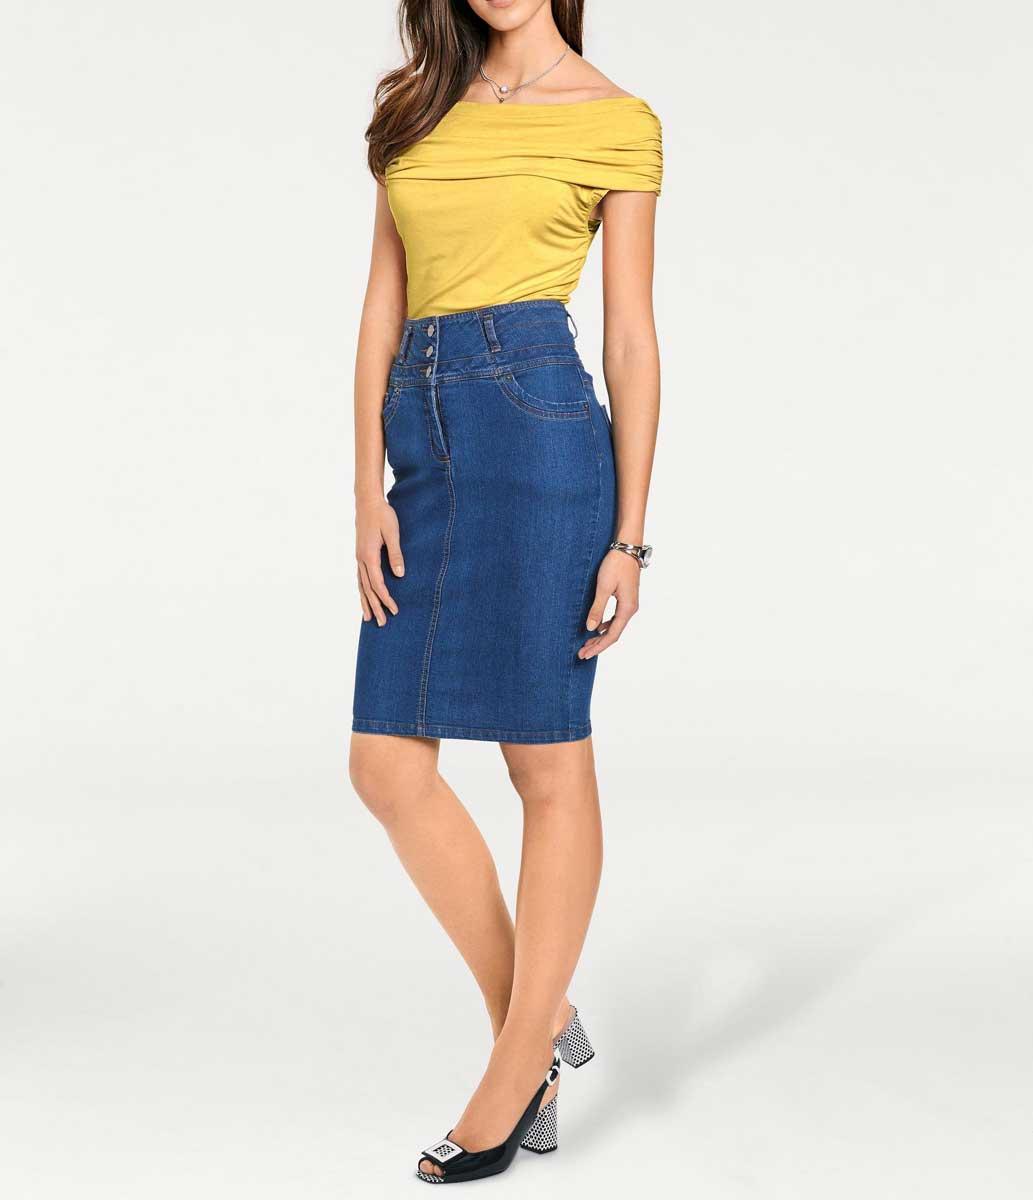 960.339 ASHLEY BROOKE Damen Designer-Carmenshirt Gelb